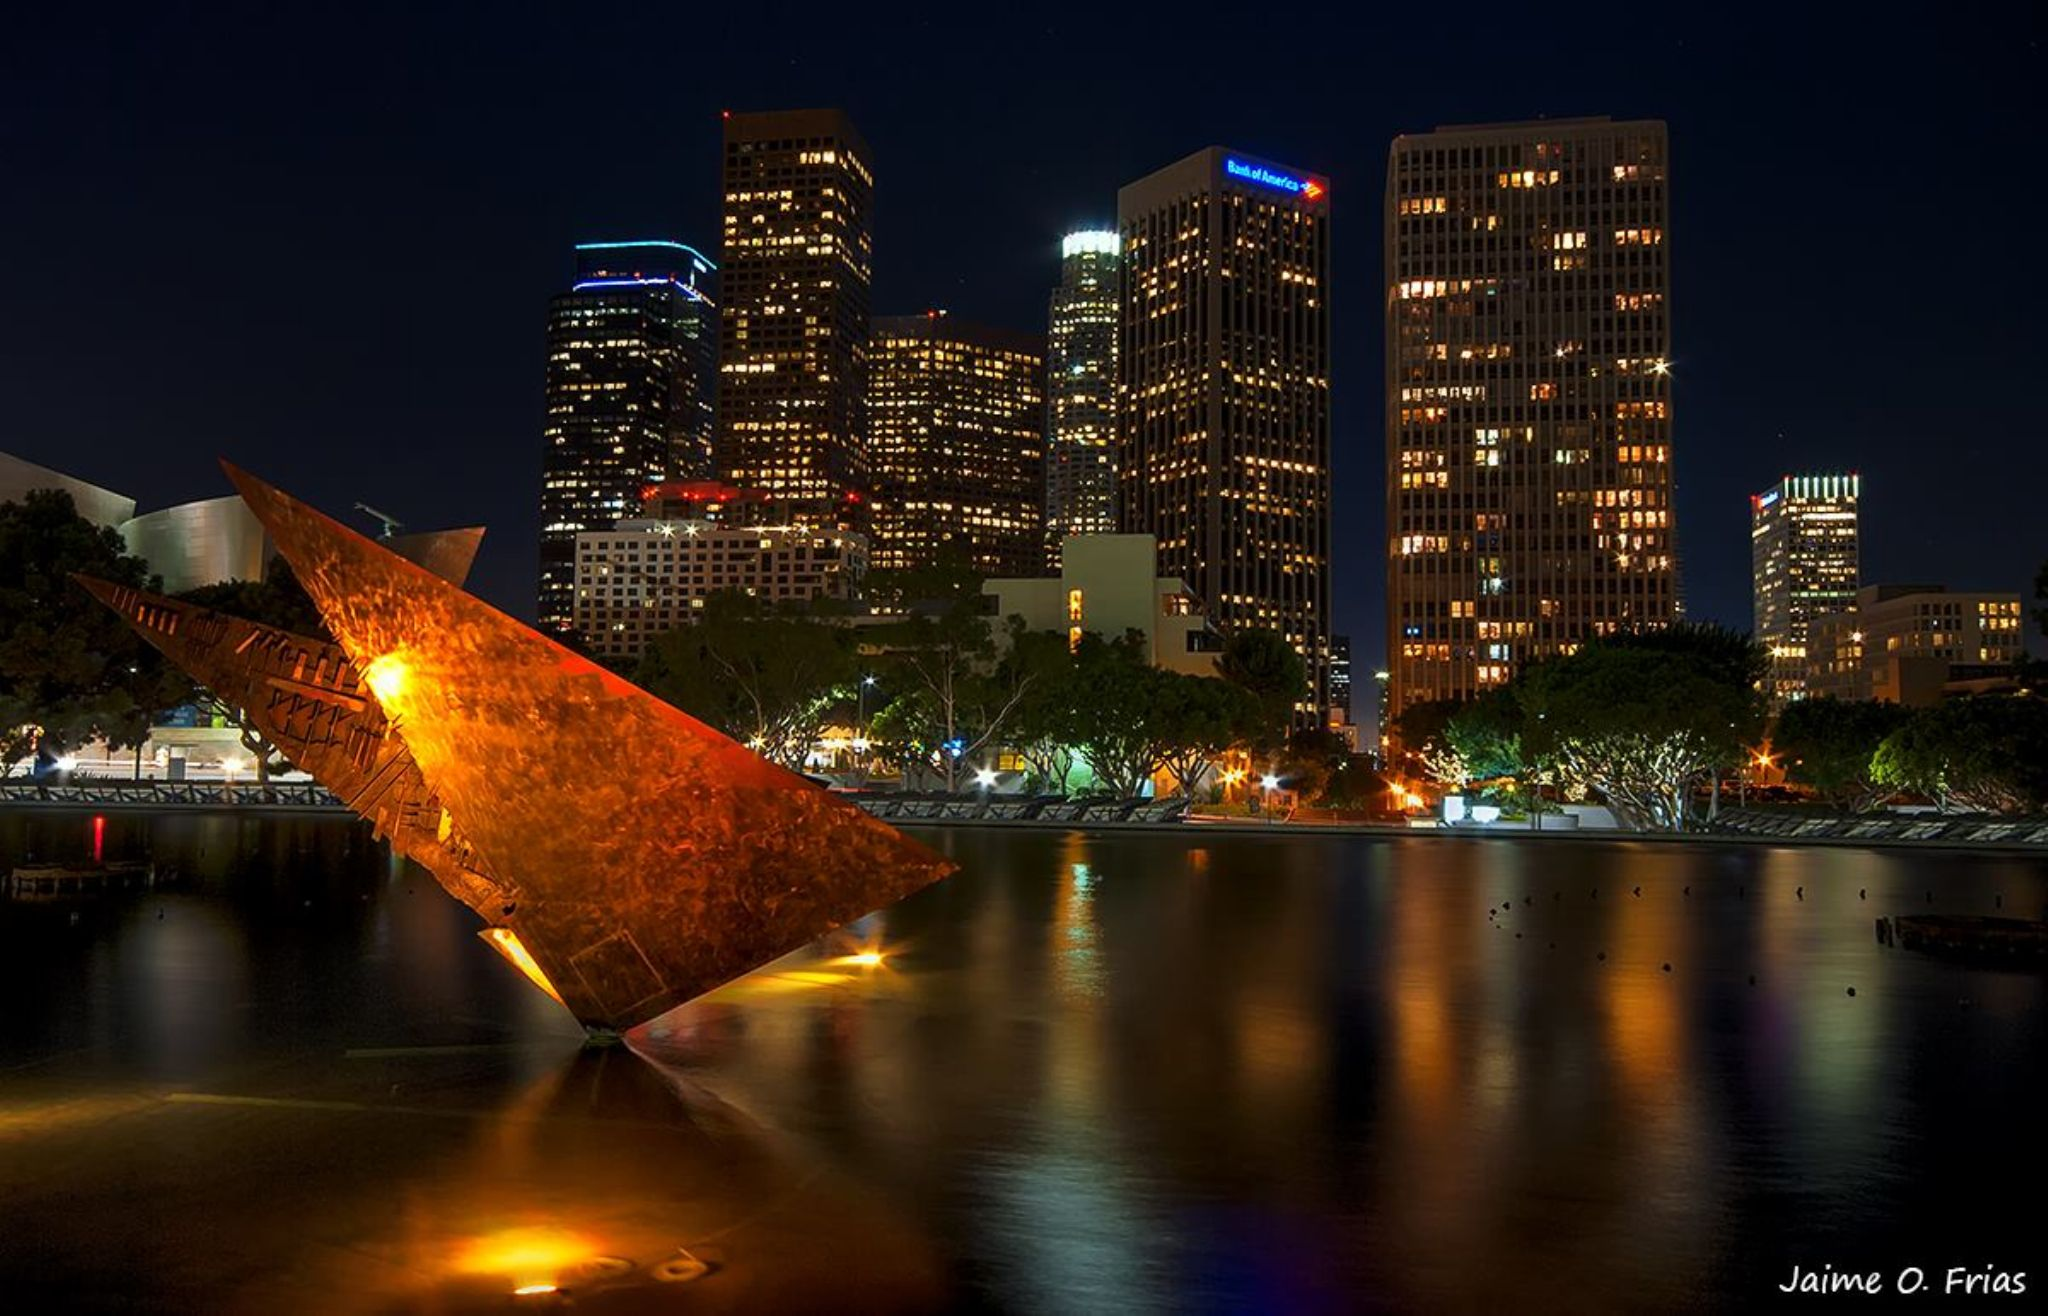 Los Angeles by Jaime O. Frias